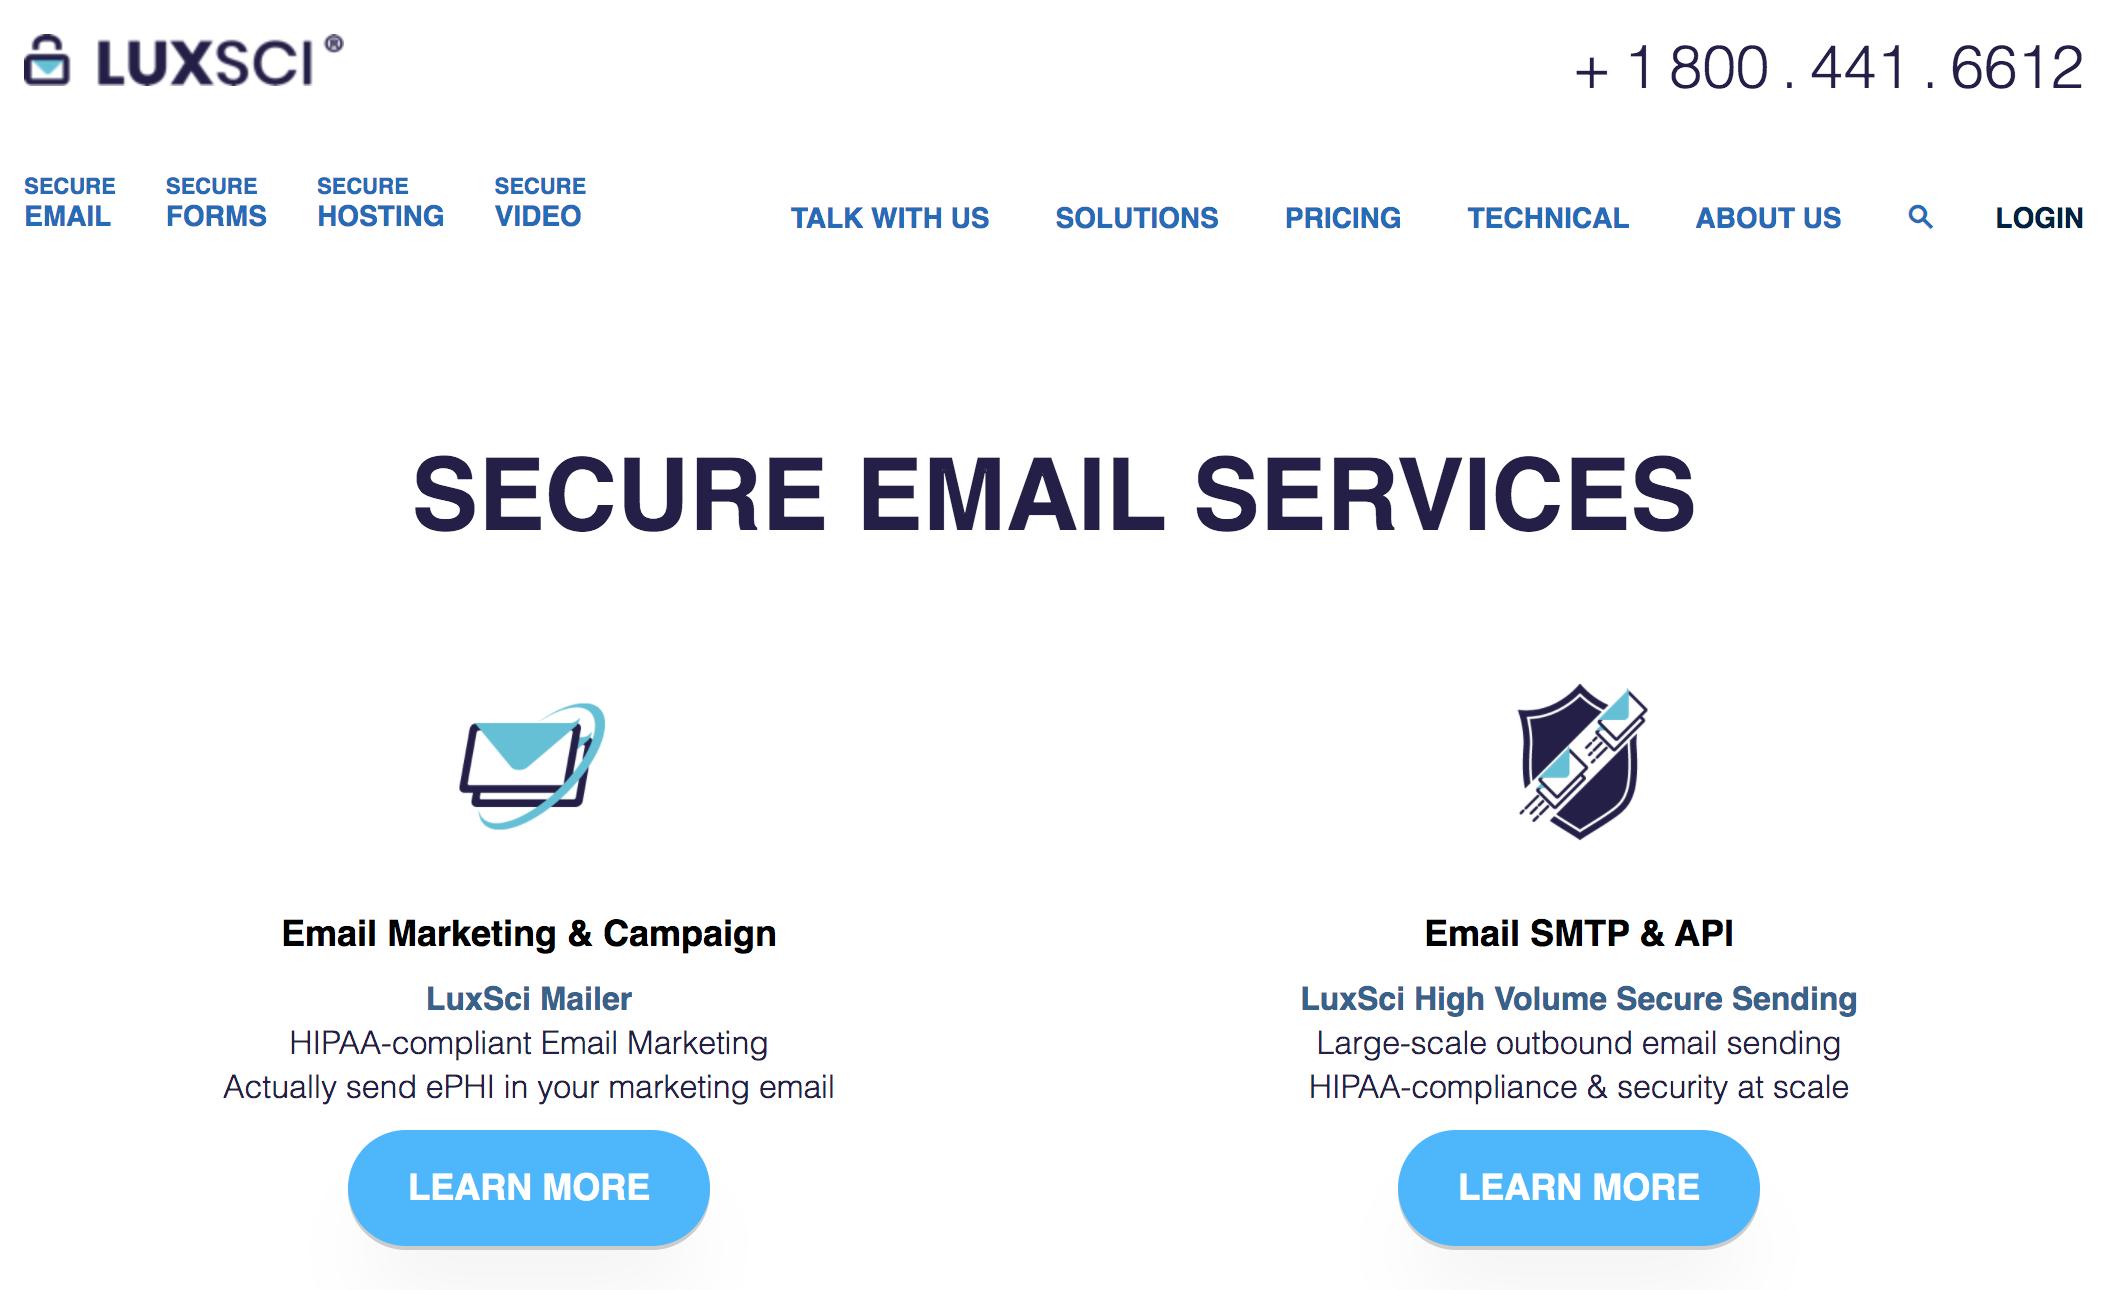 luxsci hipaa compliant email